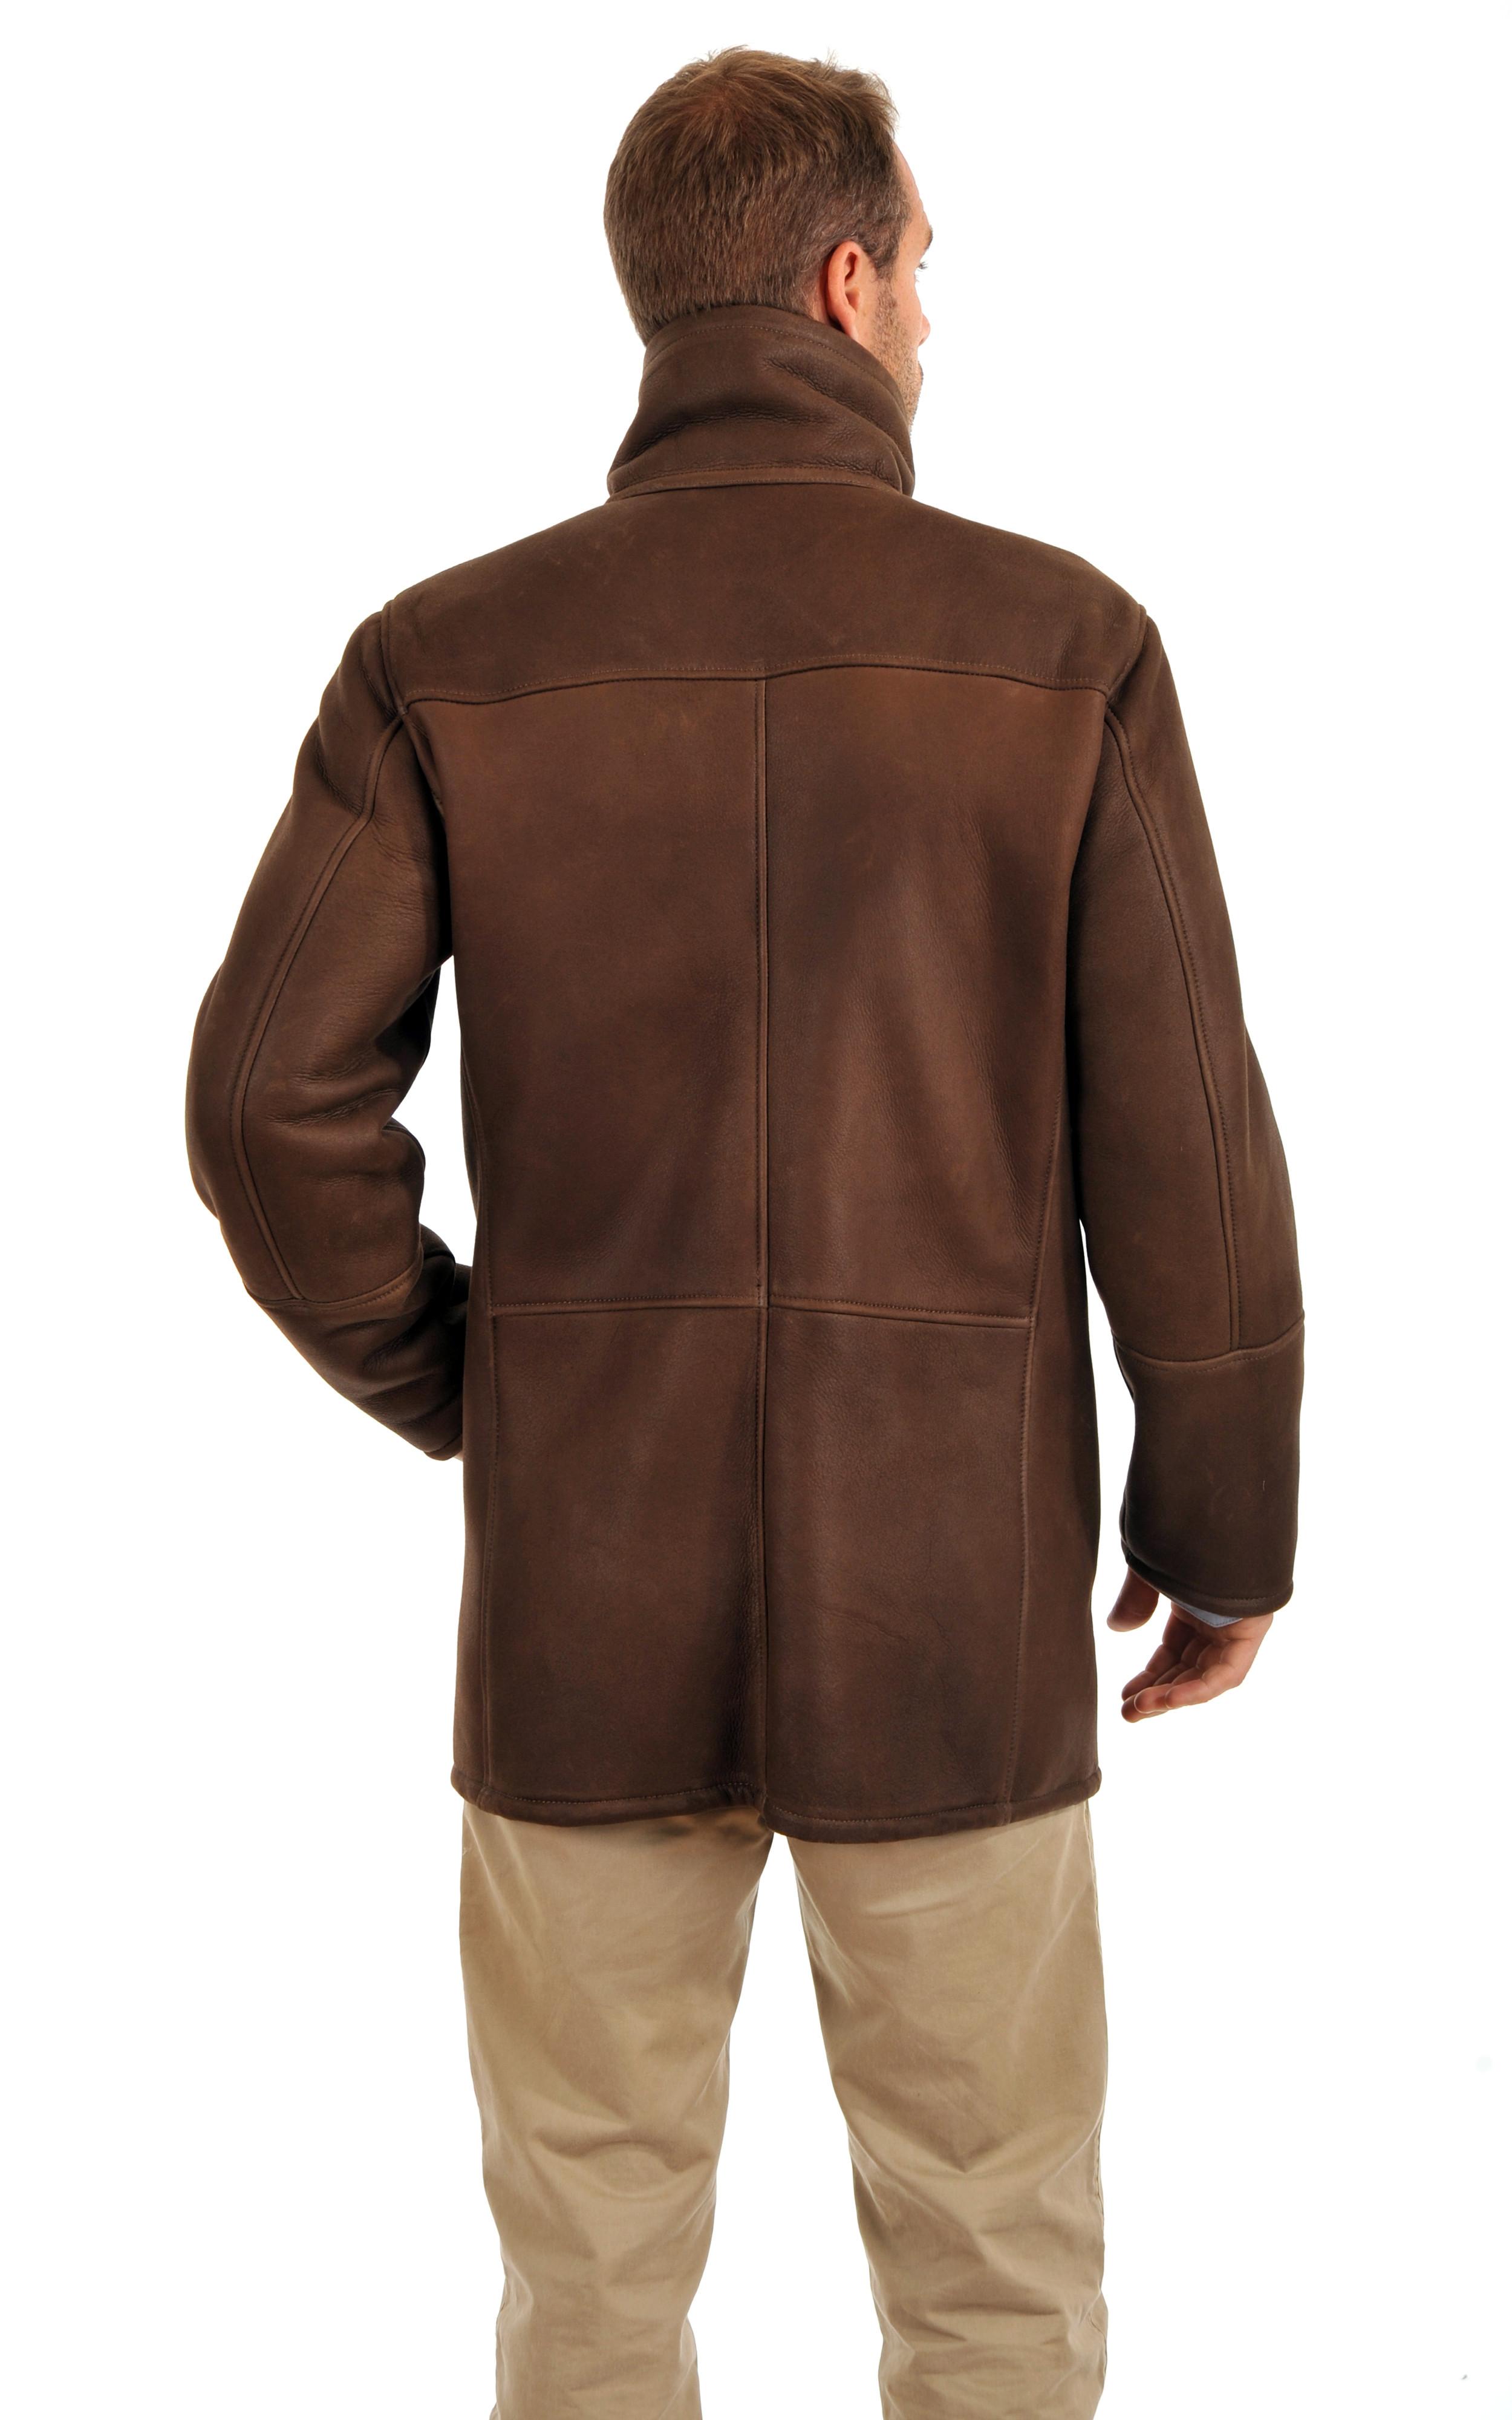 3 4 confortable pour homme maddox la canadienne veste. Black Bedroom Furniture Sets. Home Design Ideas